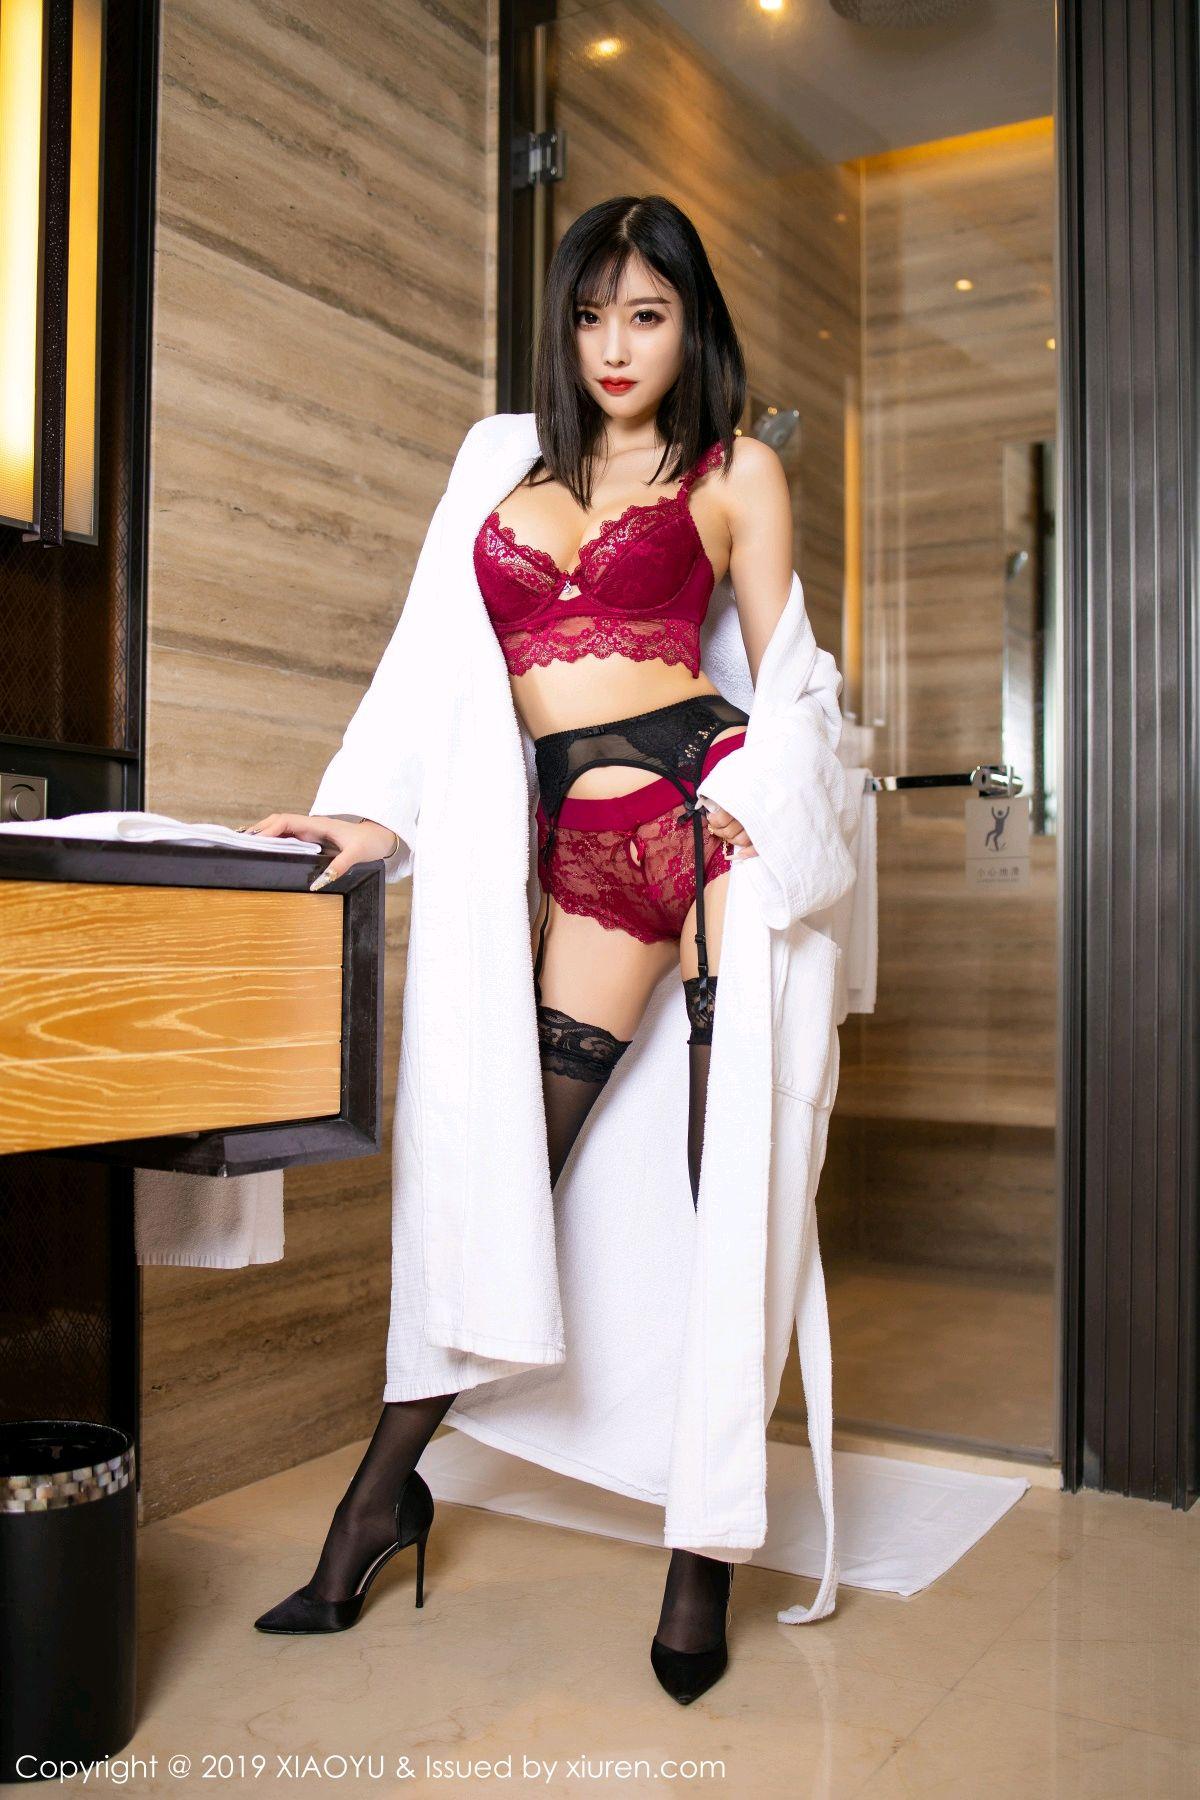 [XiaoYu] Vol.153 Yang Chen Chen 17P, Bathroom, Black Silk, Underwear, XiaoYu, Yang Chen Chen